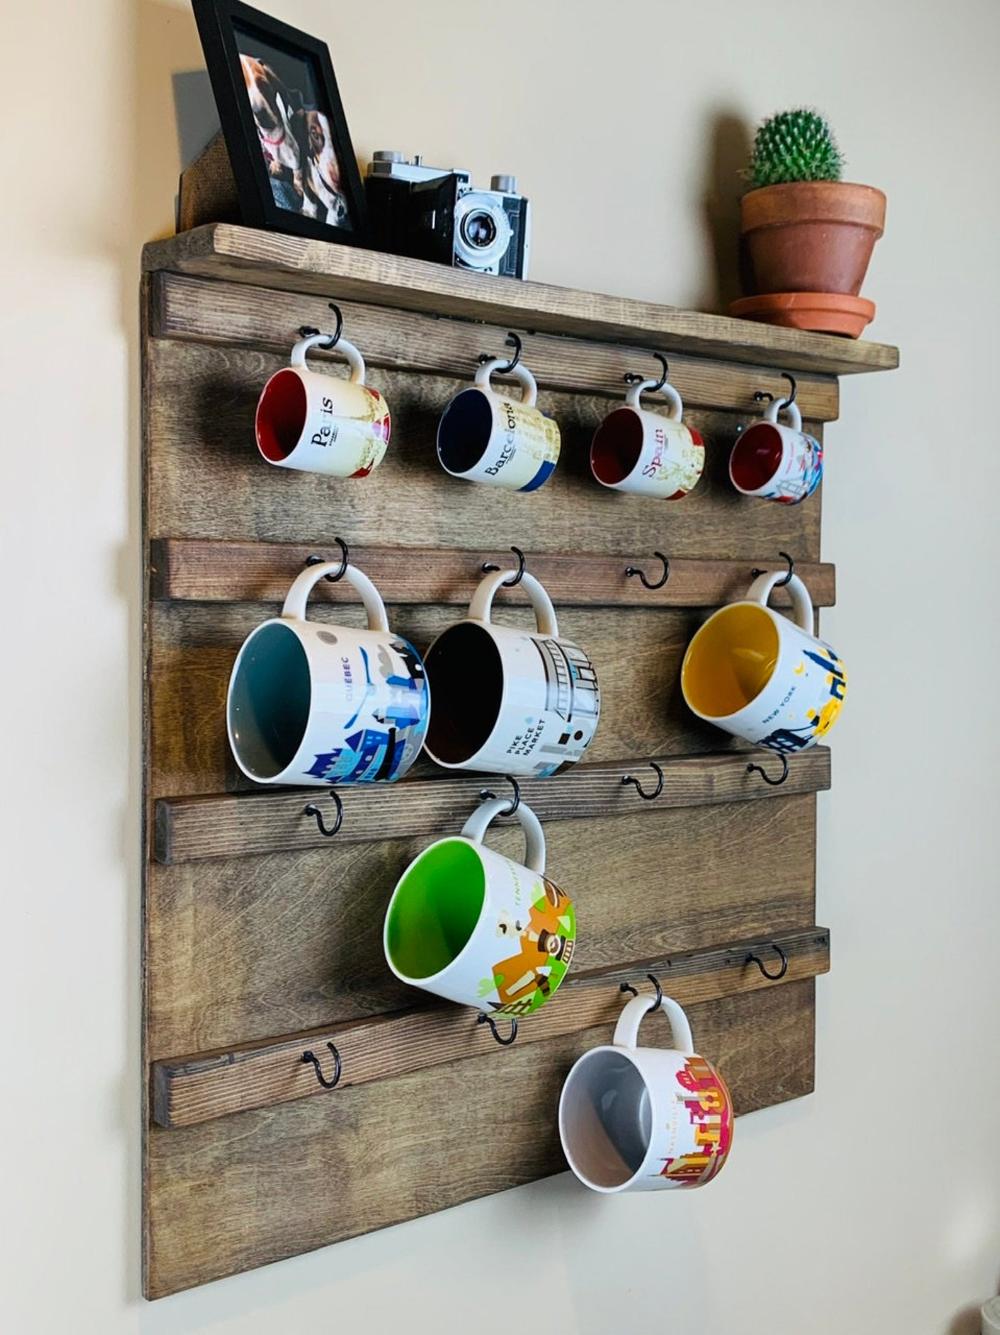 Coffee Mug Holder with Display Shelf, Wall Mounted Coffee Mug holder, Coffee Mug Rack, Coffee Mug Display, Mug Cup Shelf Storage, Starbucks